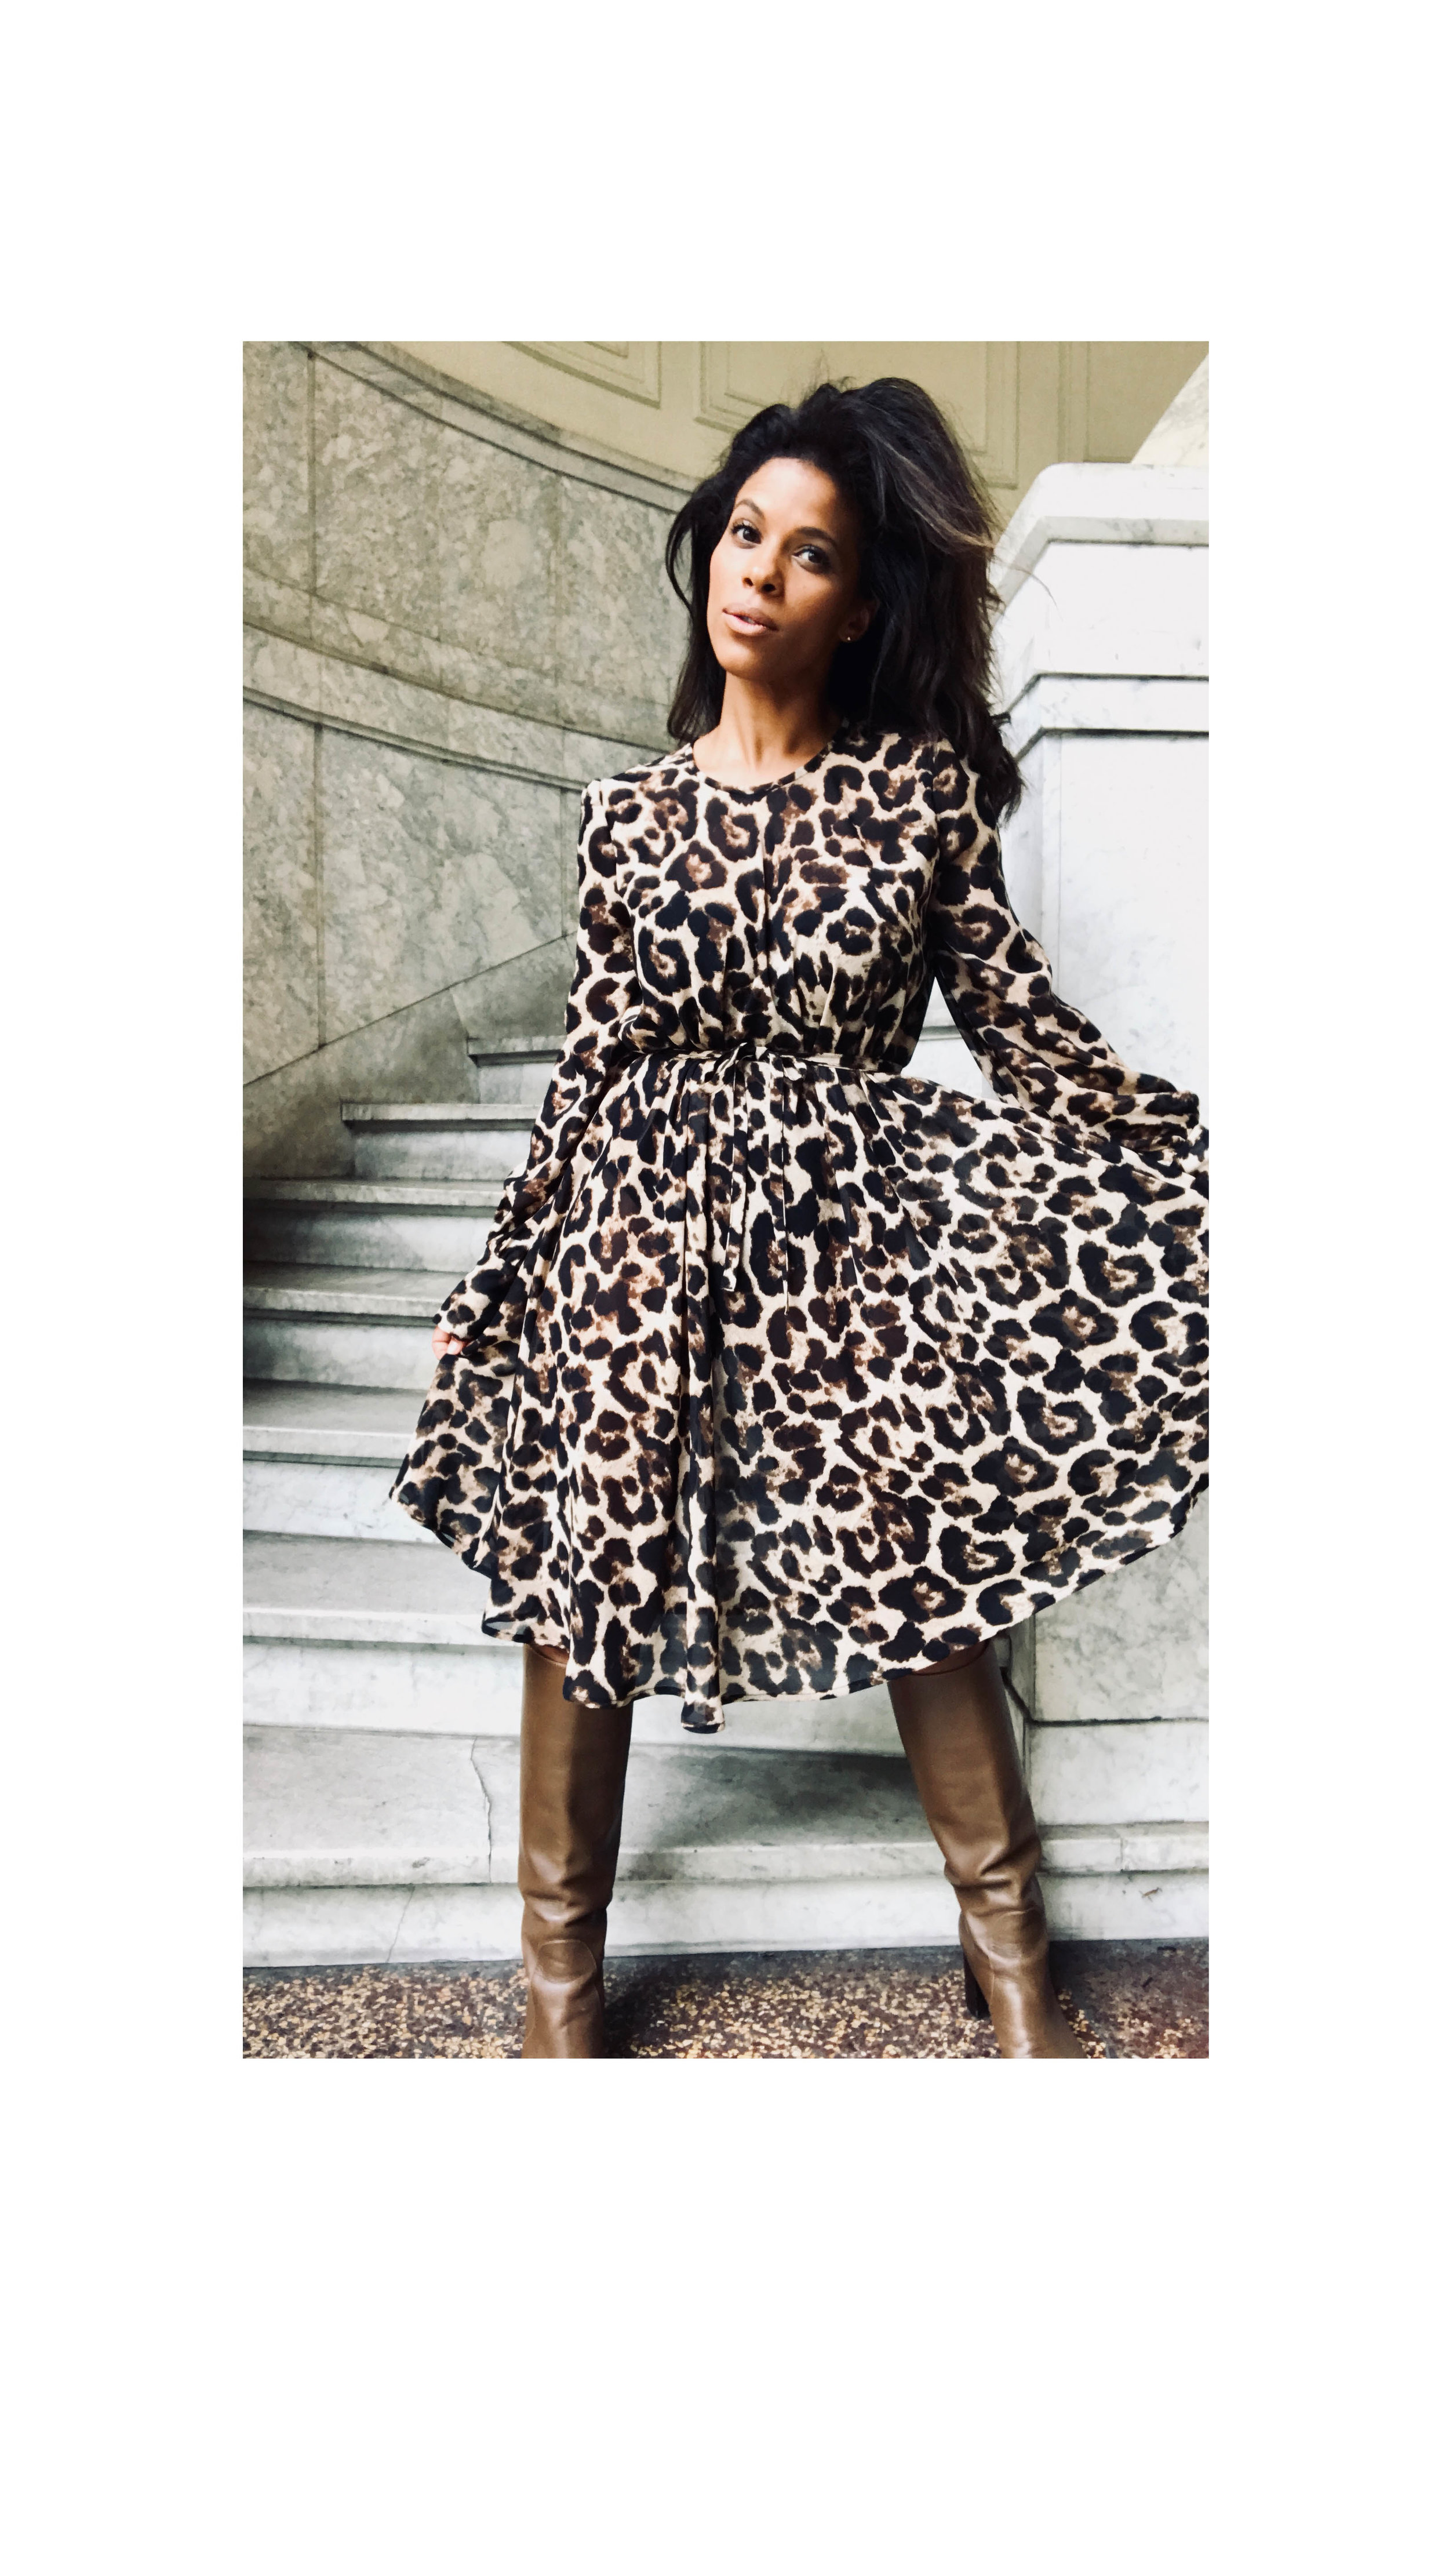 Leopard Jurk - Shop the Look